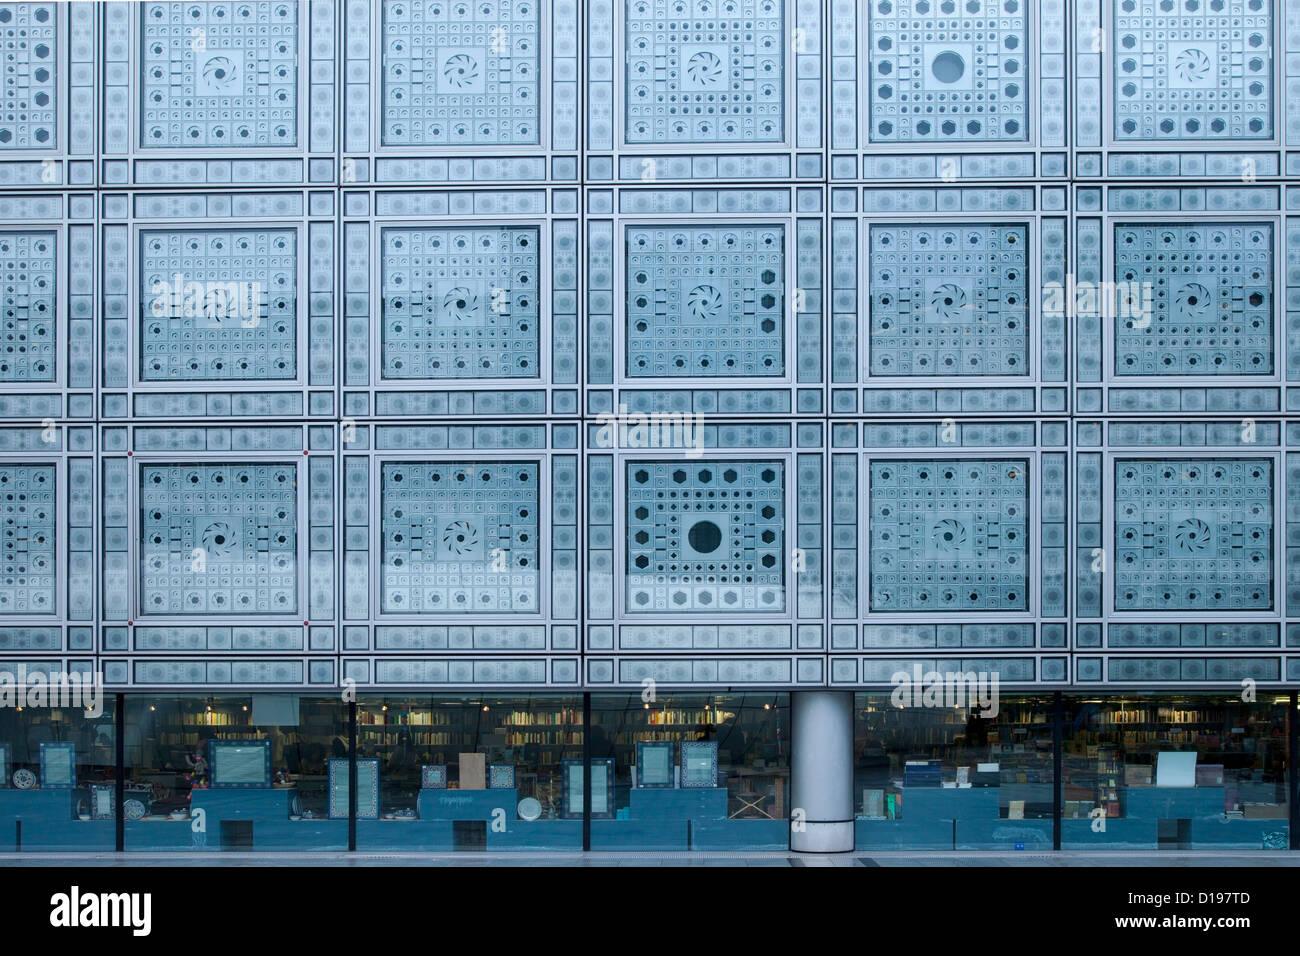 Photo Cell Window Blinds At Institut Du Monde Arabe Arab